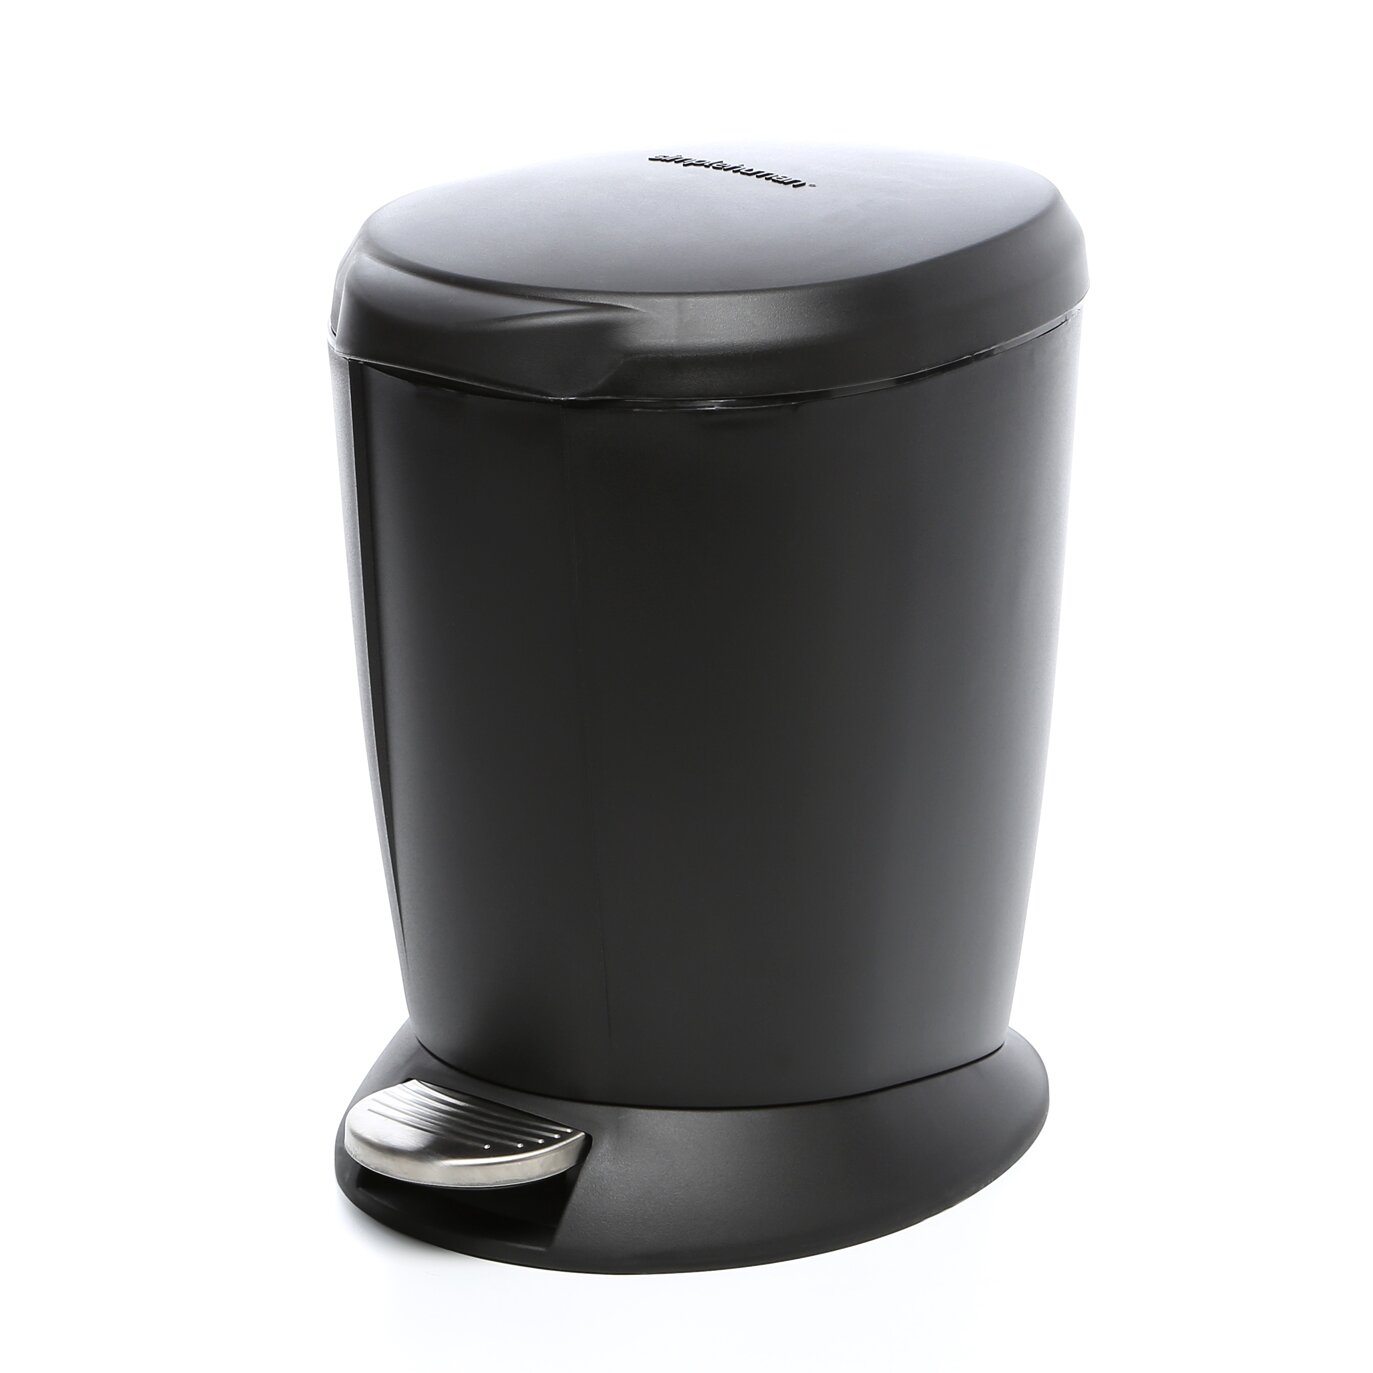 Simplehuman 1 6 Gallon Step On Plastic Trash Can Amp Reviews